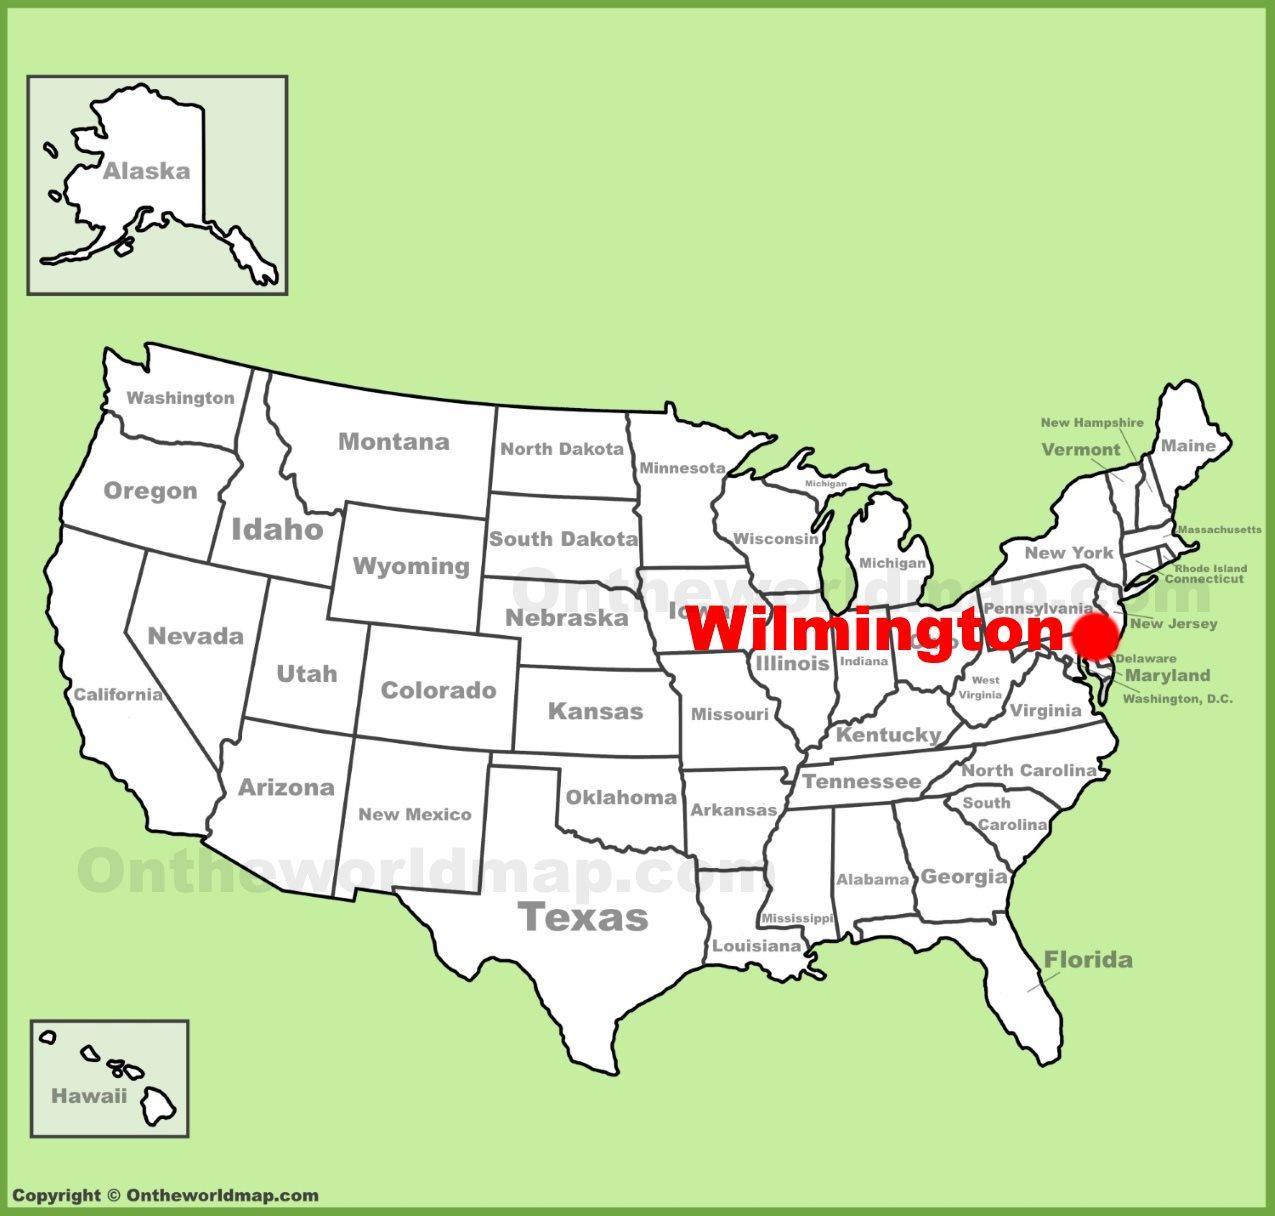 Wilmington On Us Map Wilmington DE location on the U.S. Map